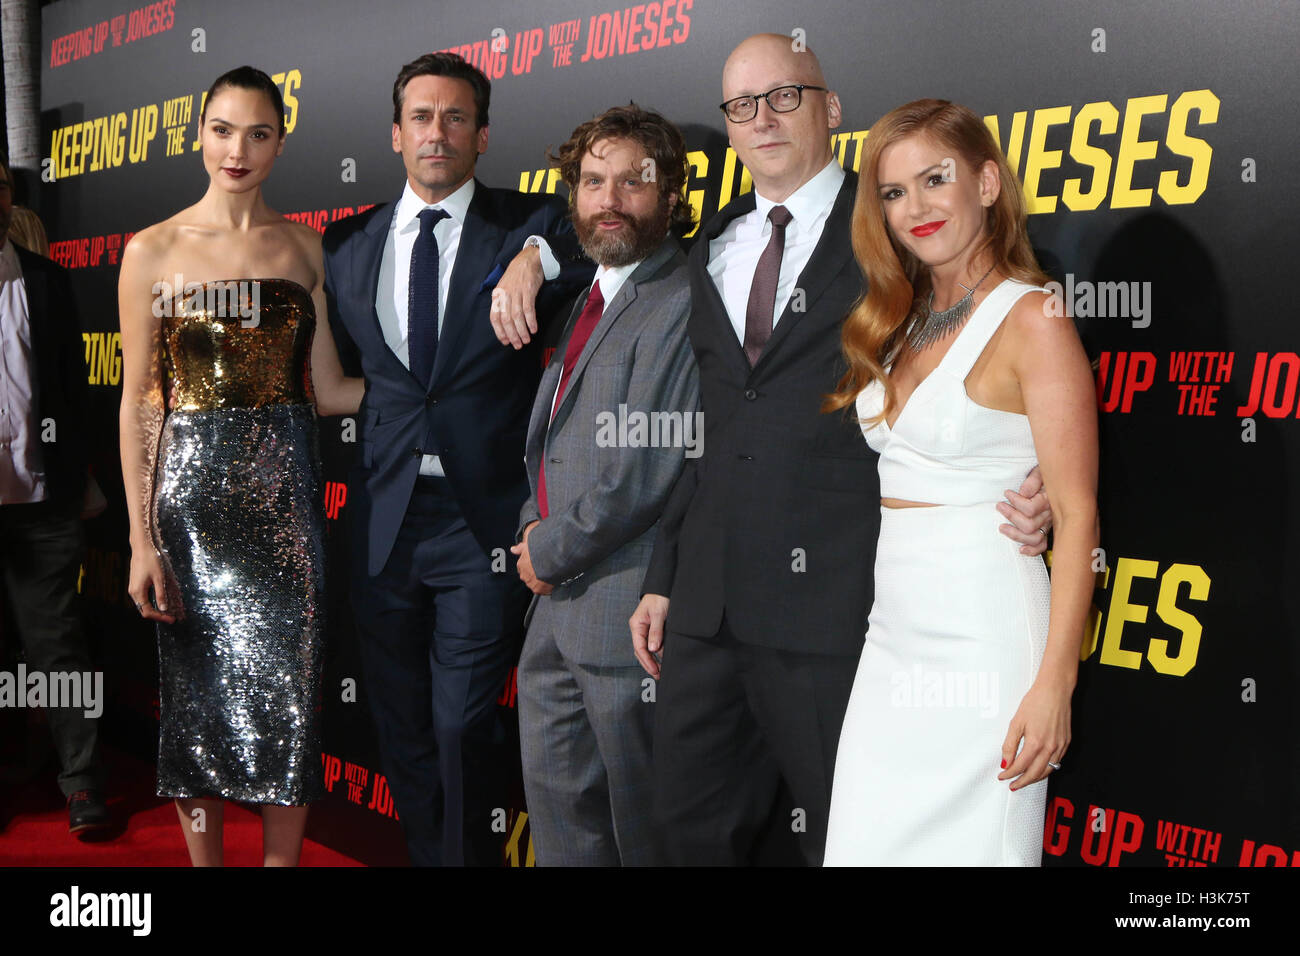 LOS ANGELES, CA - 8. Oktober: Gal Gadot, Jon Hamm, Zach Galifianakis, Greg Mottola, Isla Fisher bei der 'Keeping Stockbild